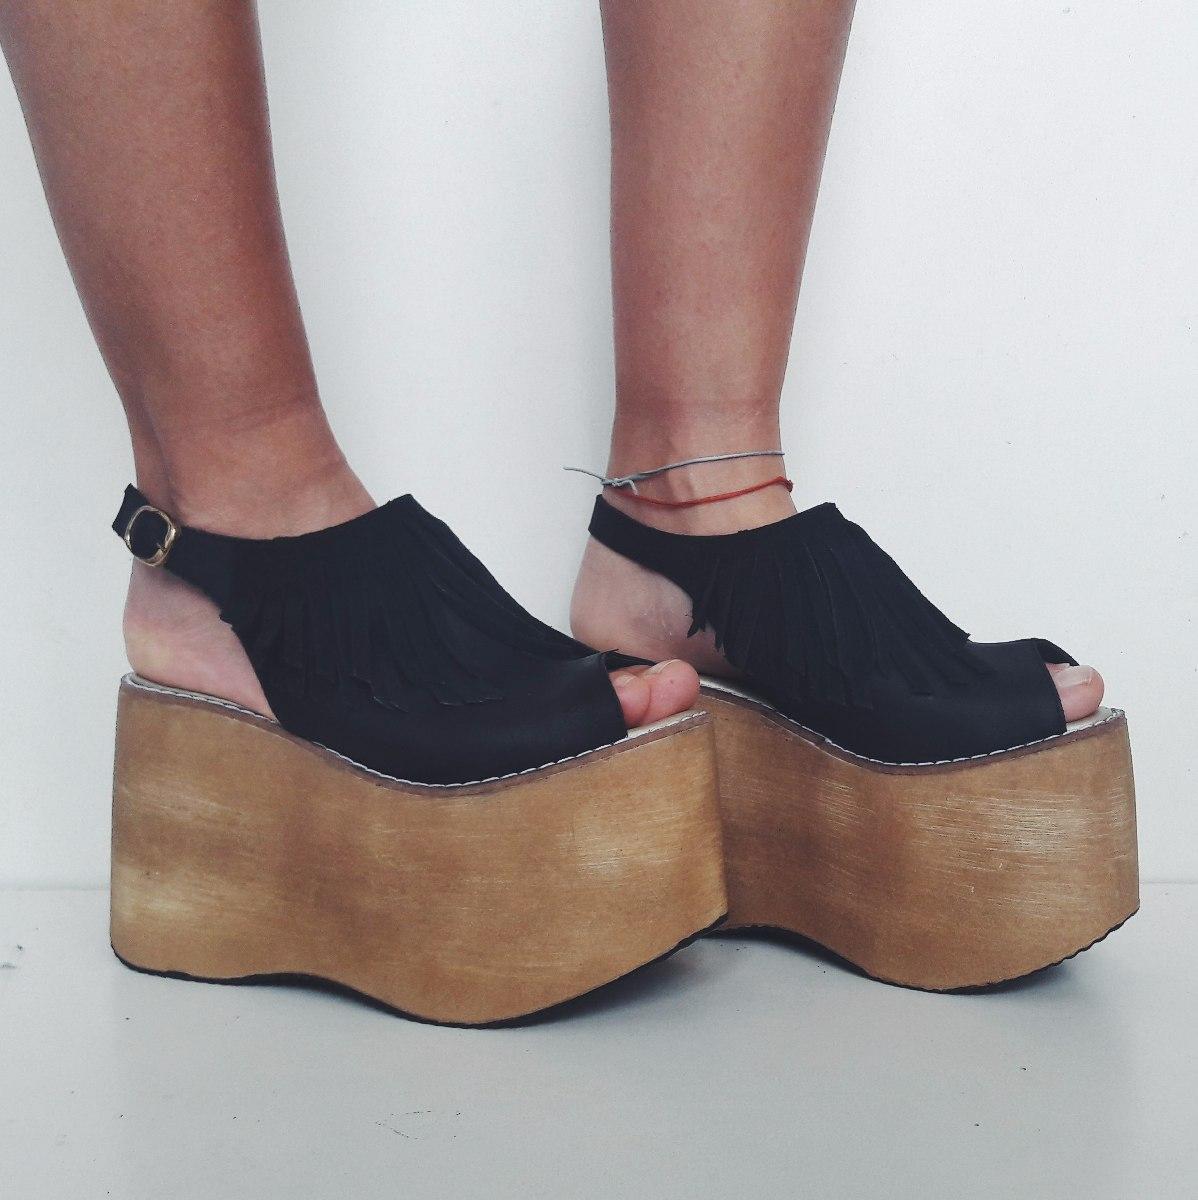 25f300c902 sandalias flecos altas plataforma mujer madera. Cargando zoom.